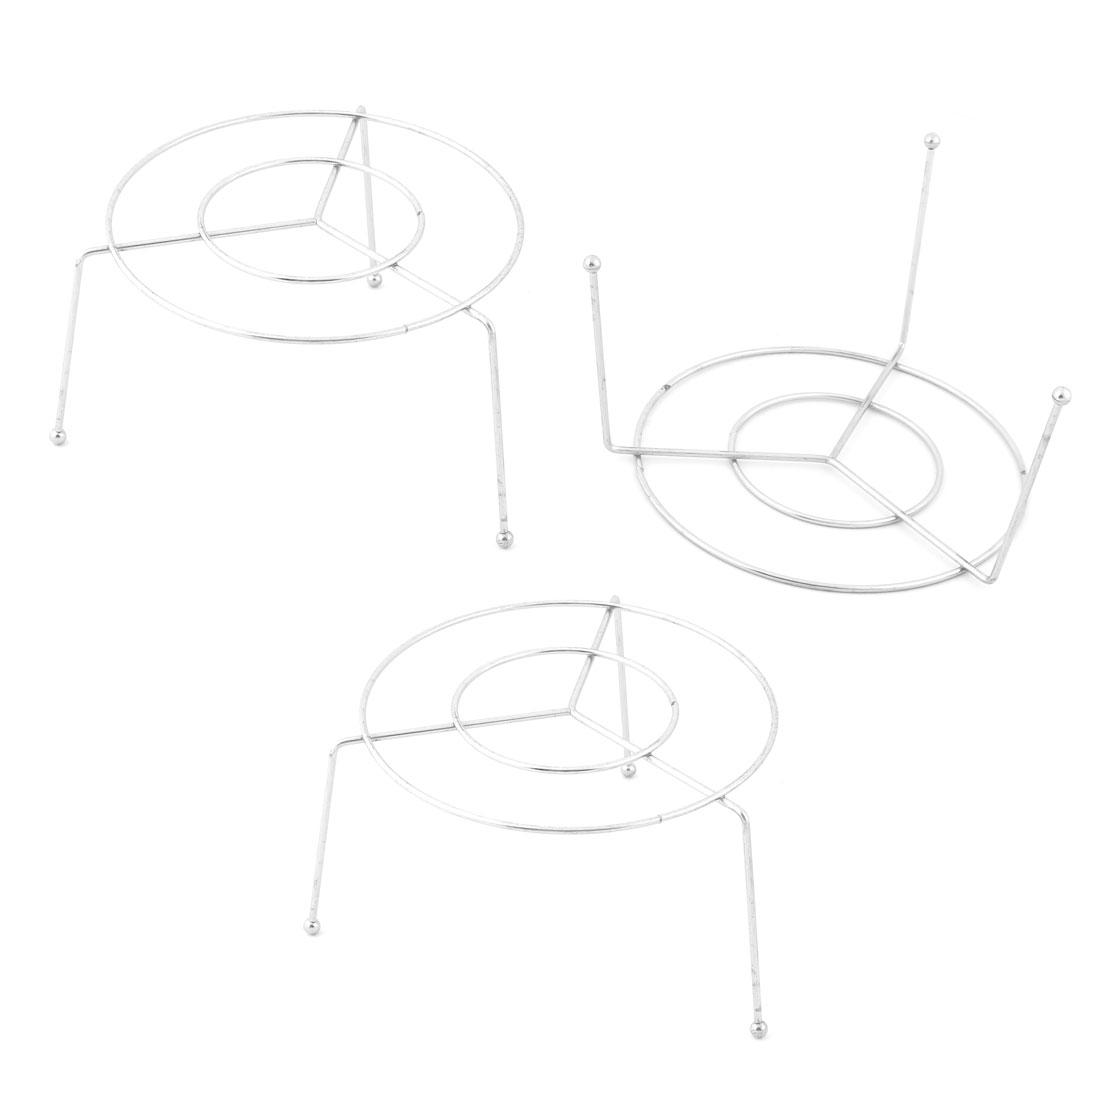 Stainless Steel Round Shape 3 Legs Design Steam Rack 11.3cm x 7cm 3 Pcs